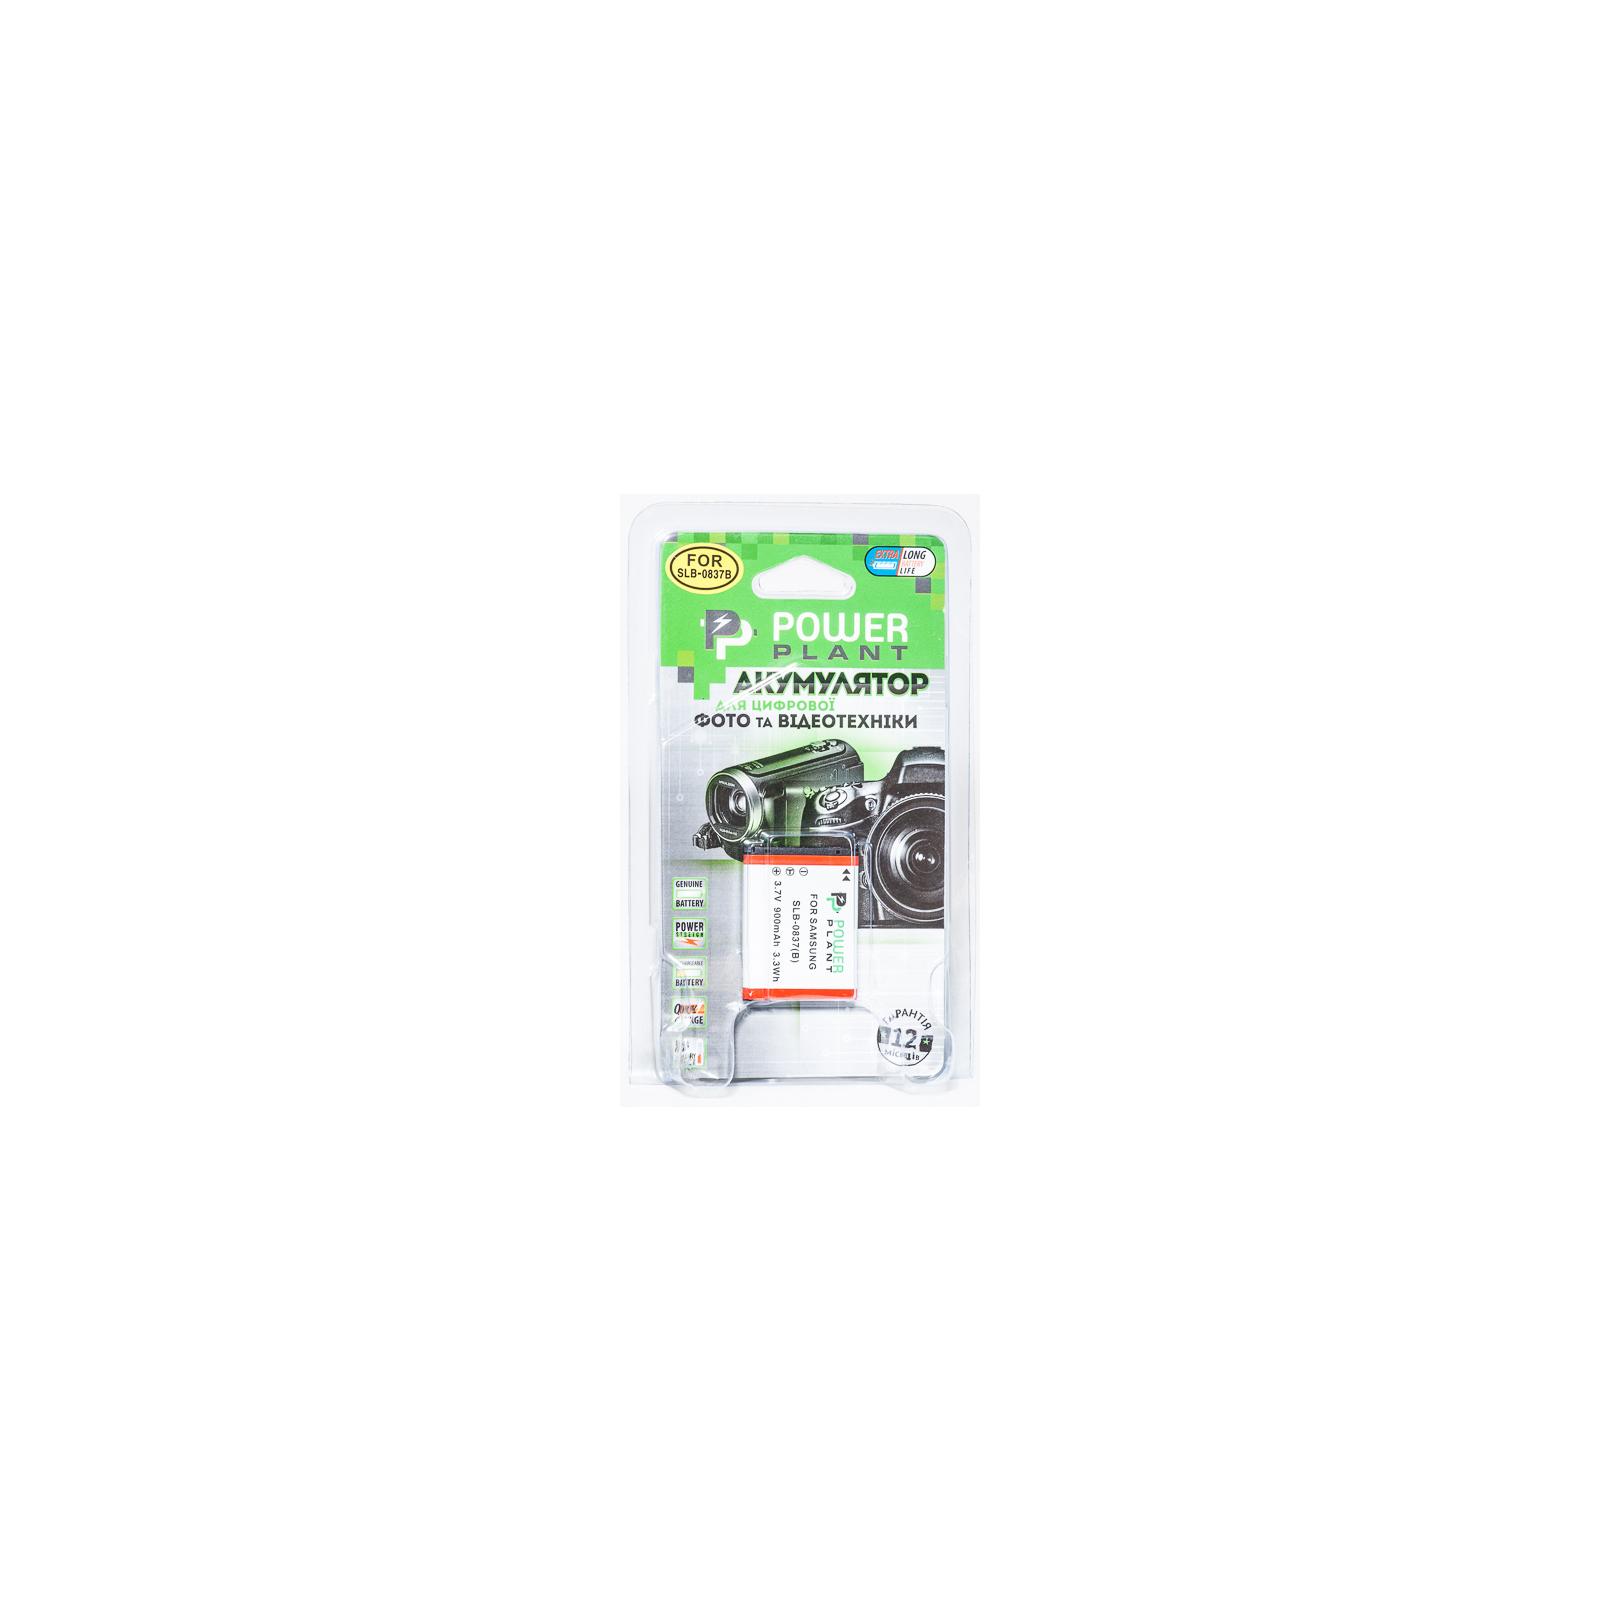 Аккумулятор к фото/видео PowerPlant Samsung SLB-0837B (DV00DV1178) изображение 3